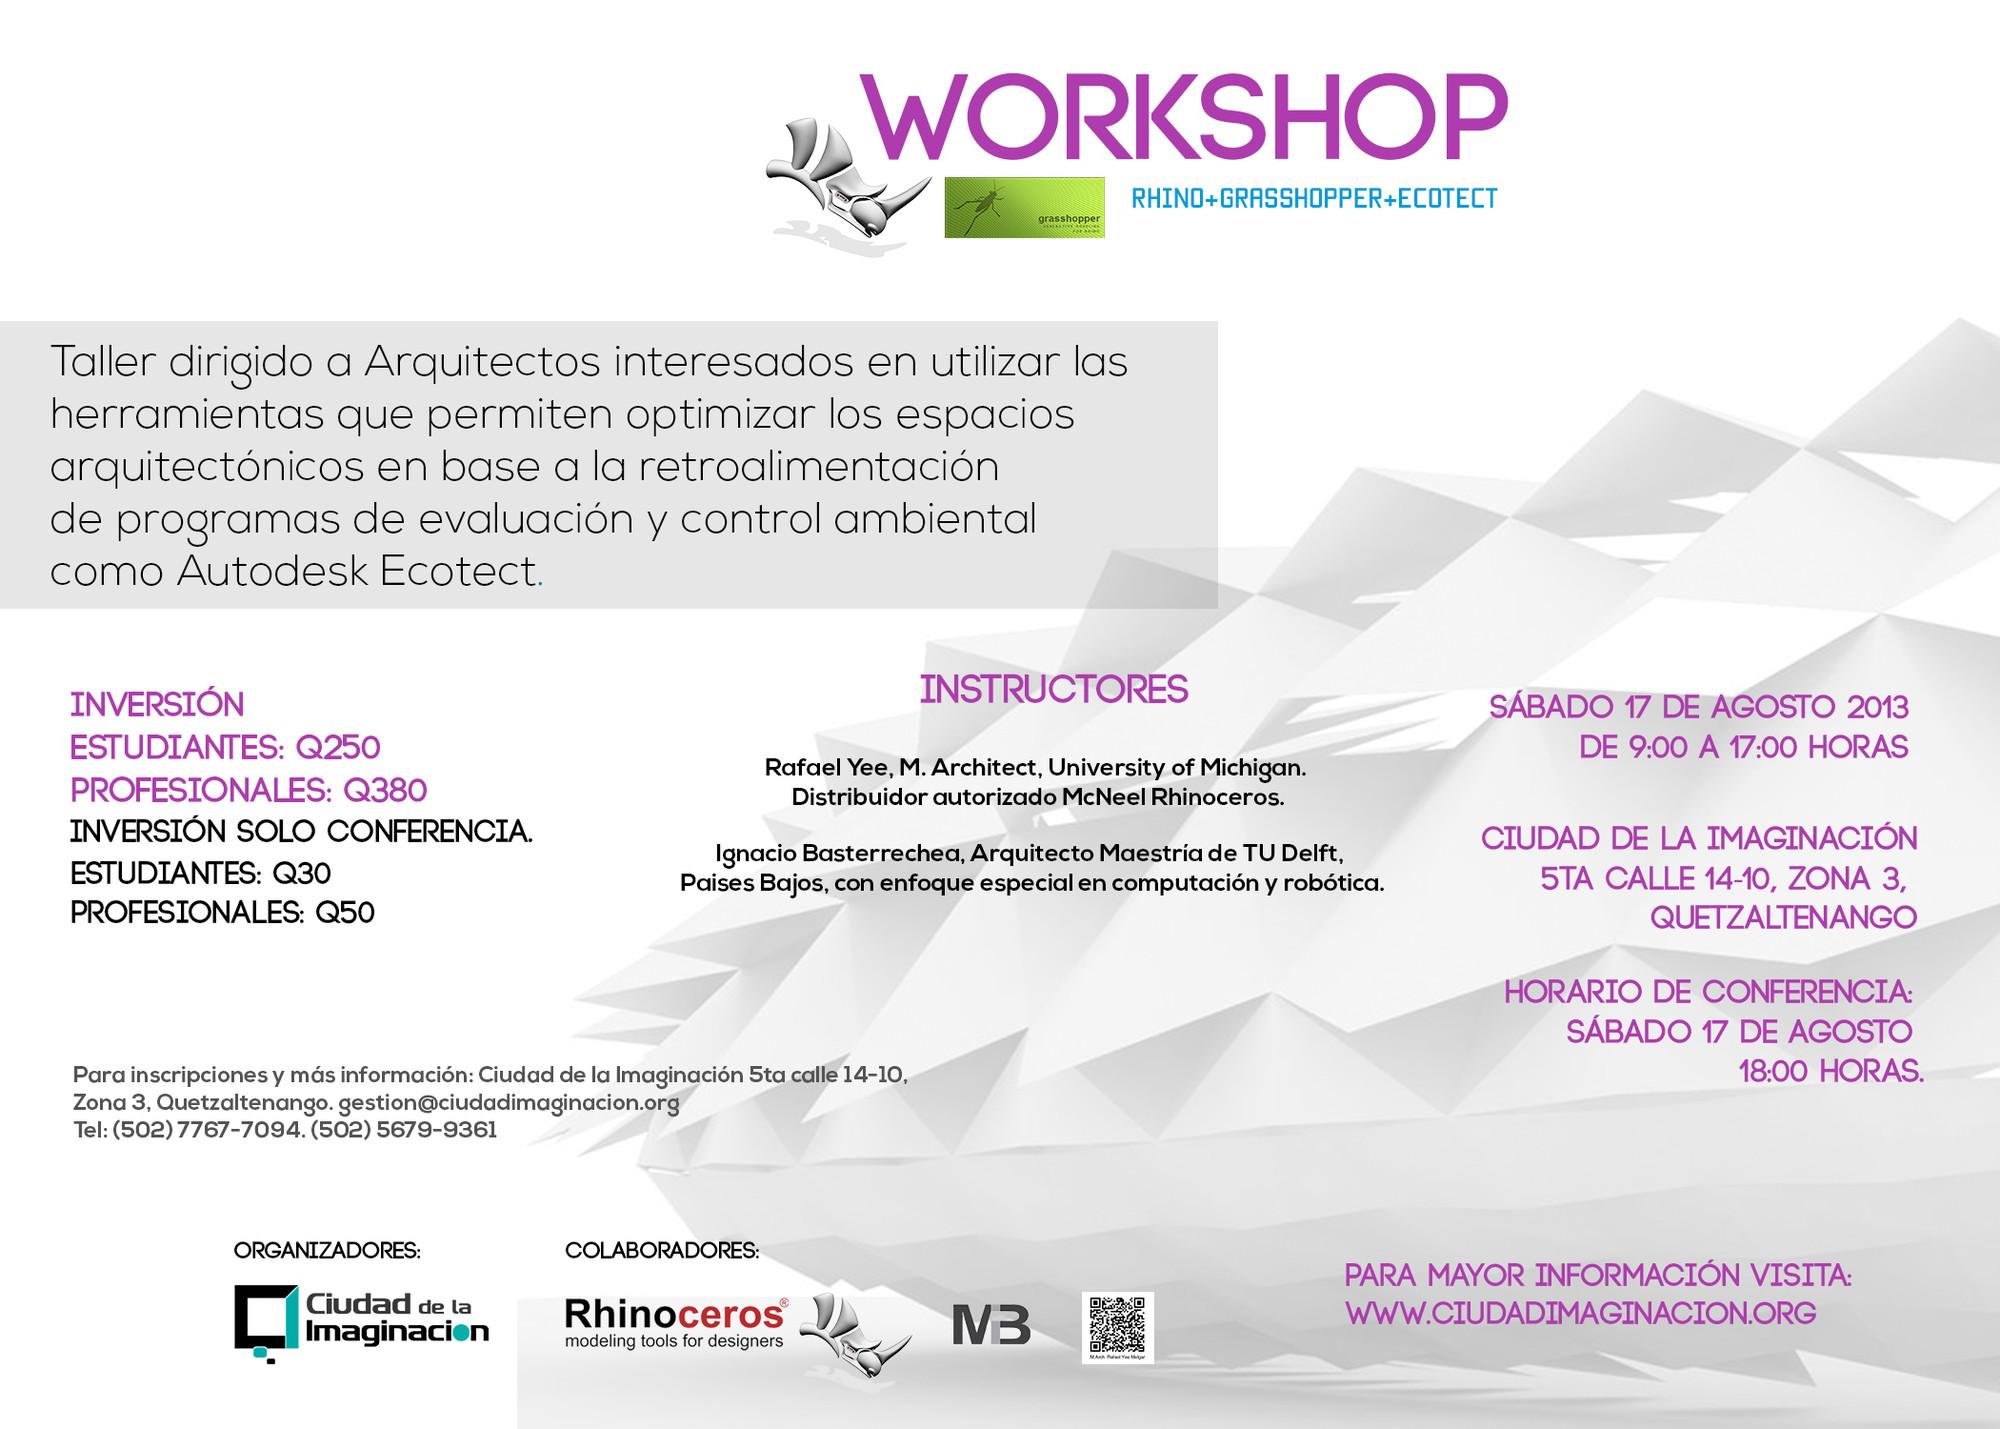 Workshop en Guatemala / RHINO+GRASSHOPPER+ECOTECT [¡Sorteamos un Cupo!]